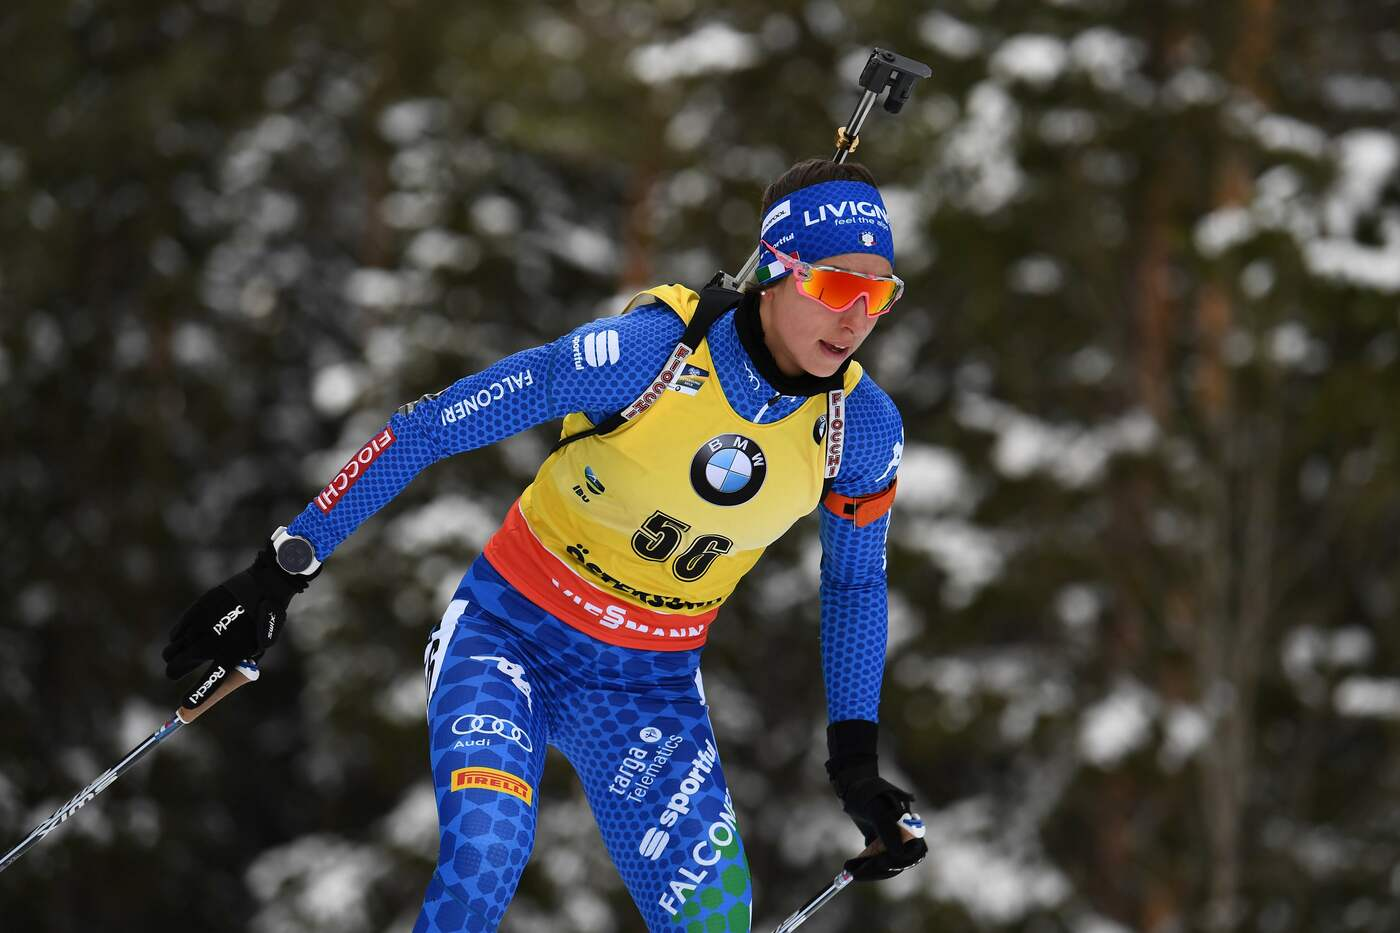 Calendario Biathlon.Mondiali Biathlon Di Oestersund Calendario Risultati E